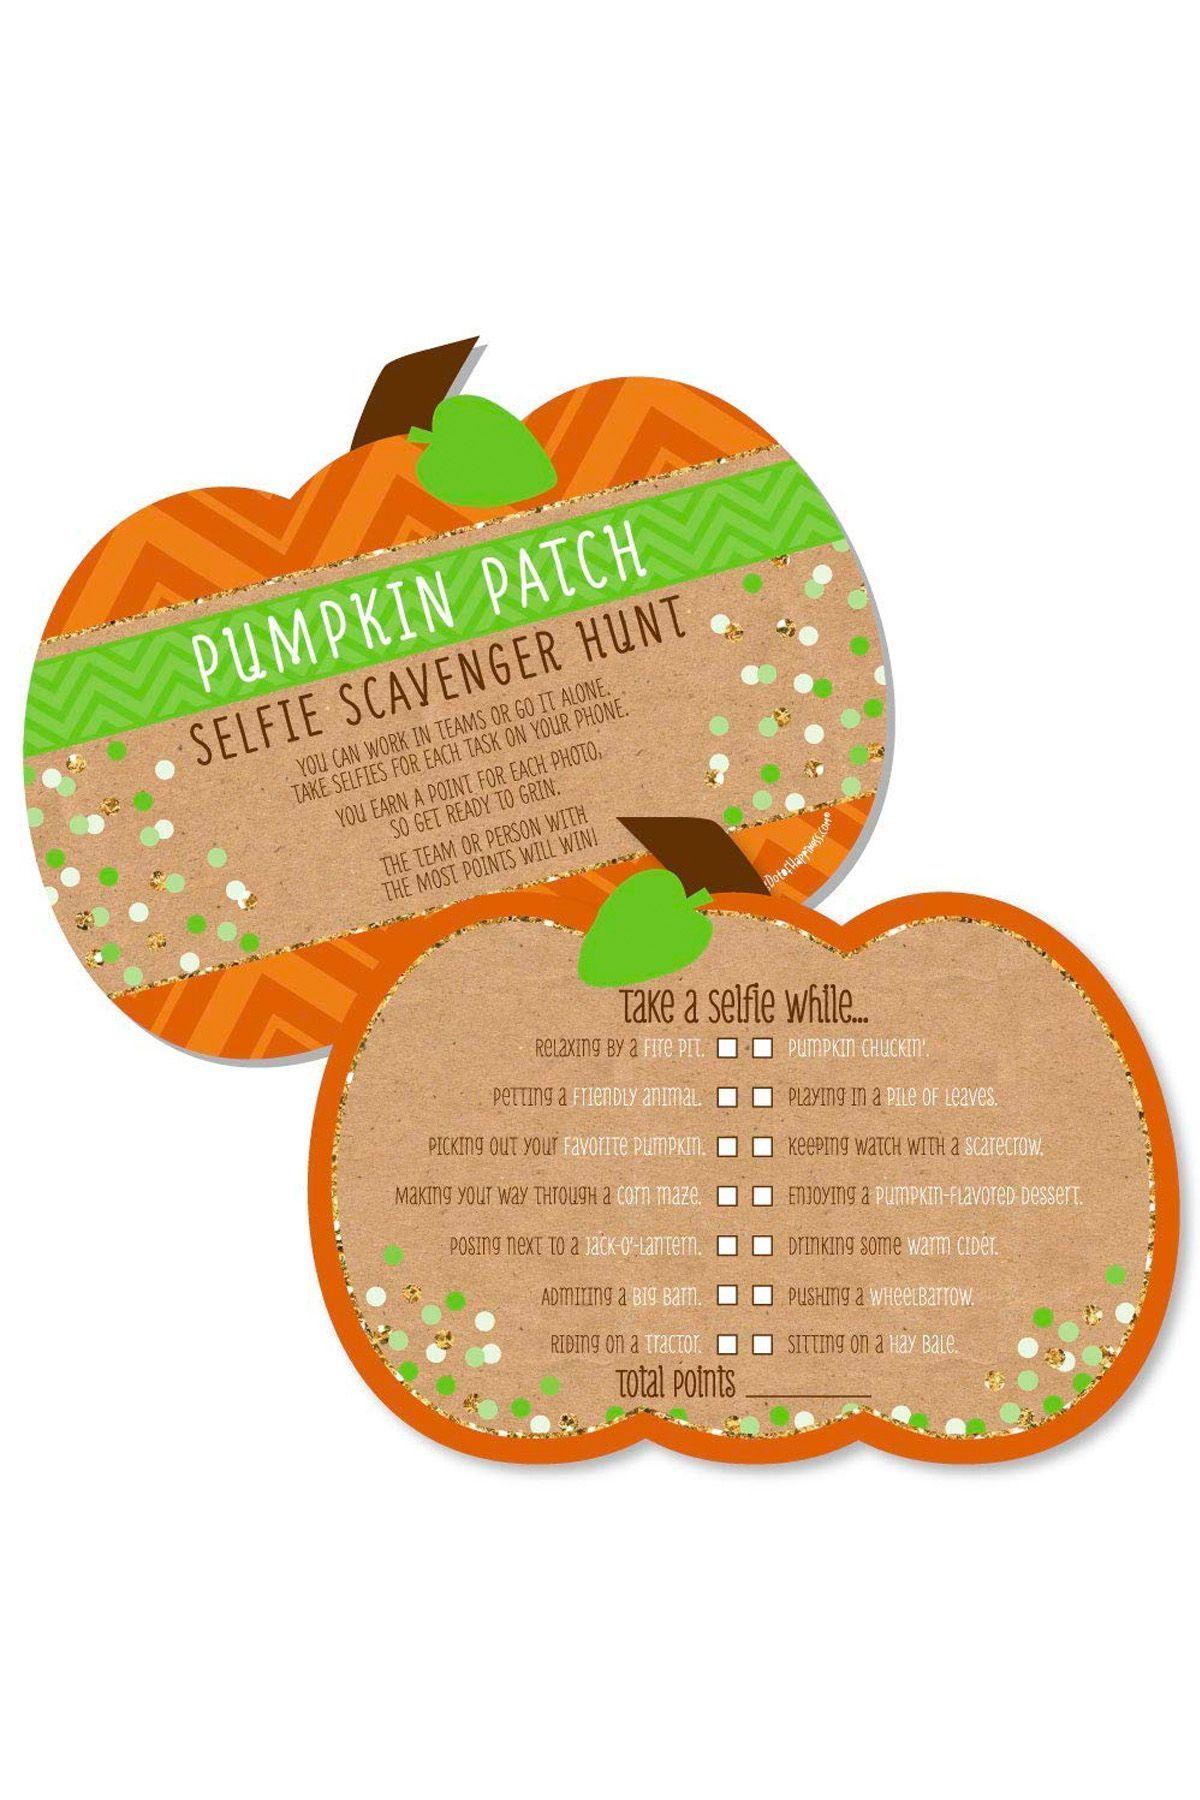 Pumpkin Patch Selfie Scavenger Hunt